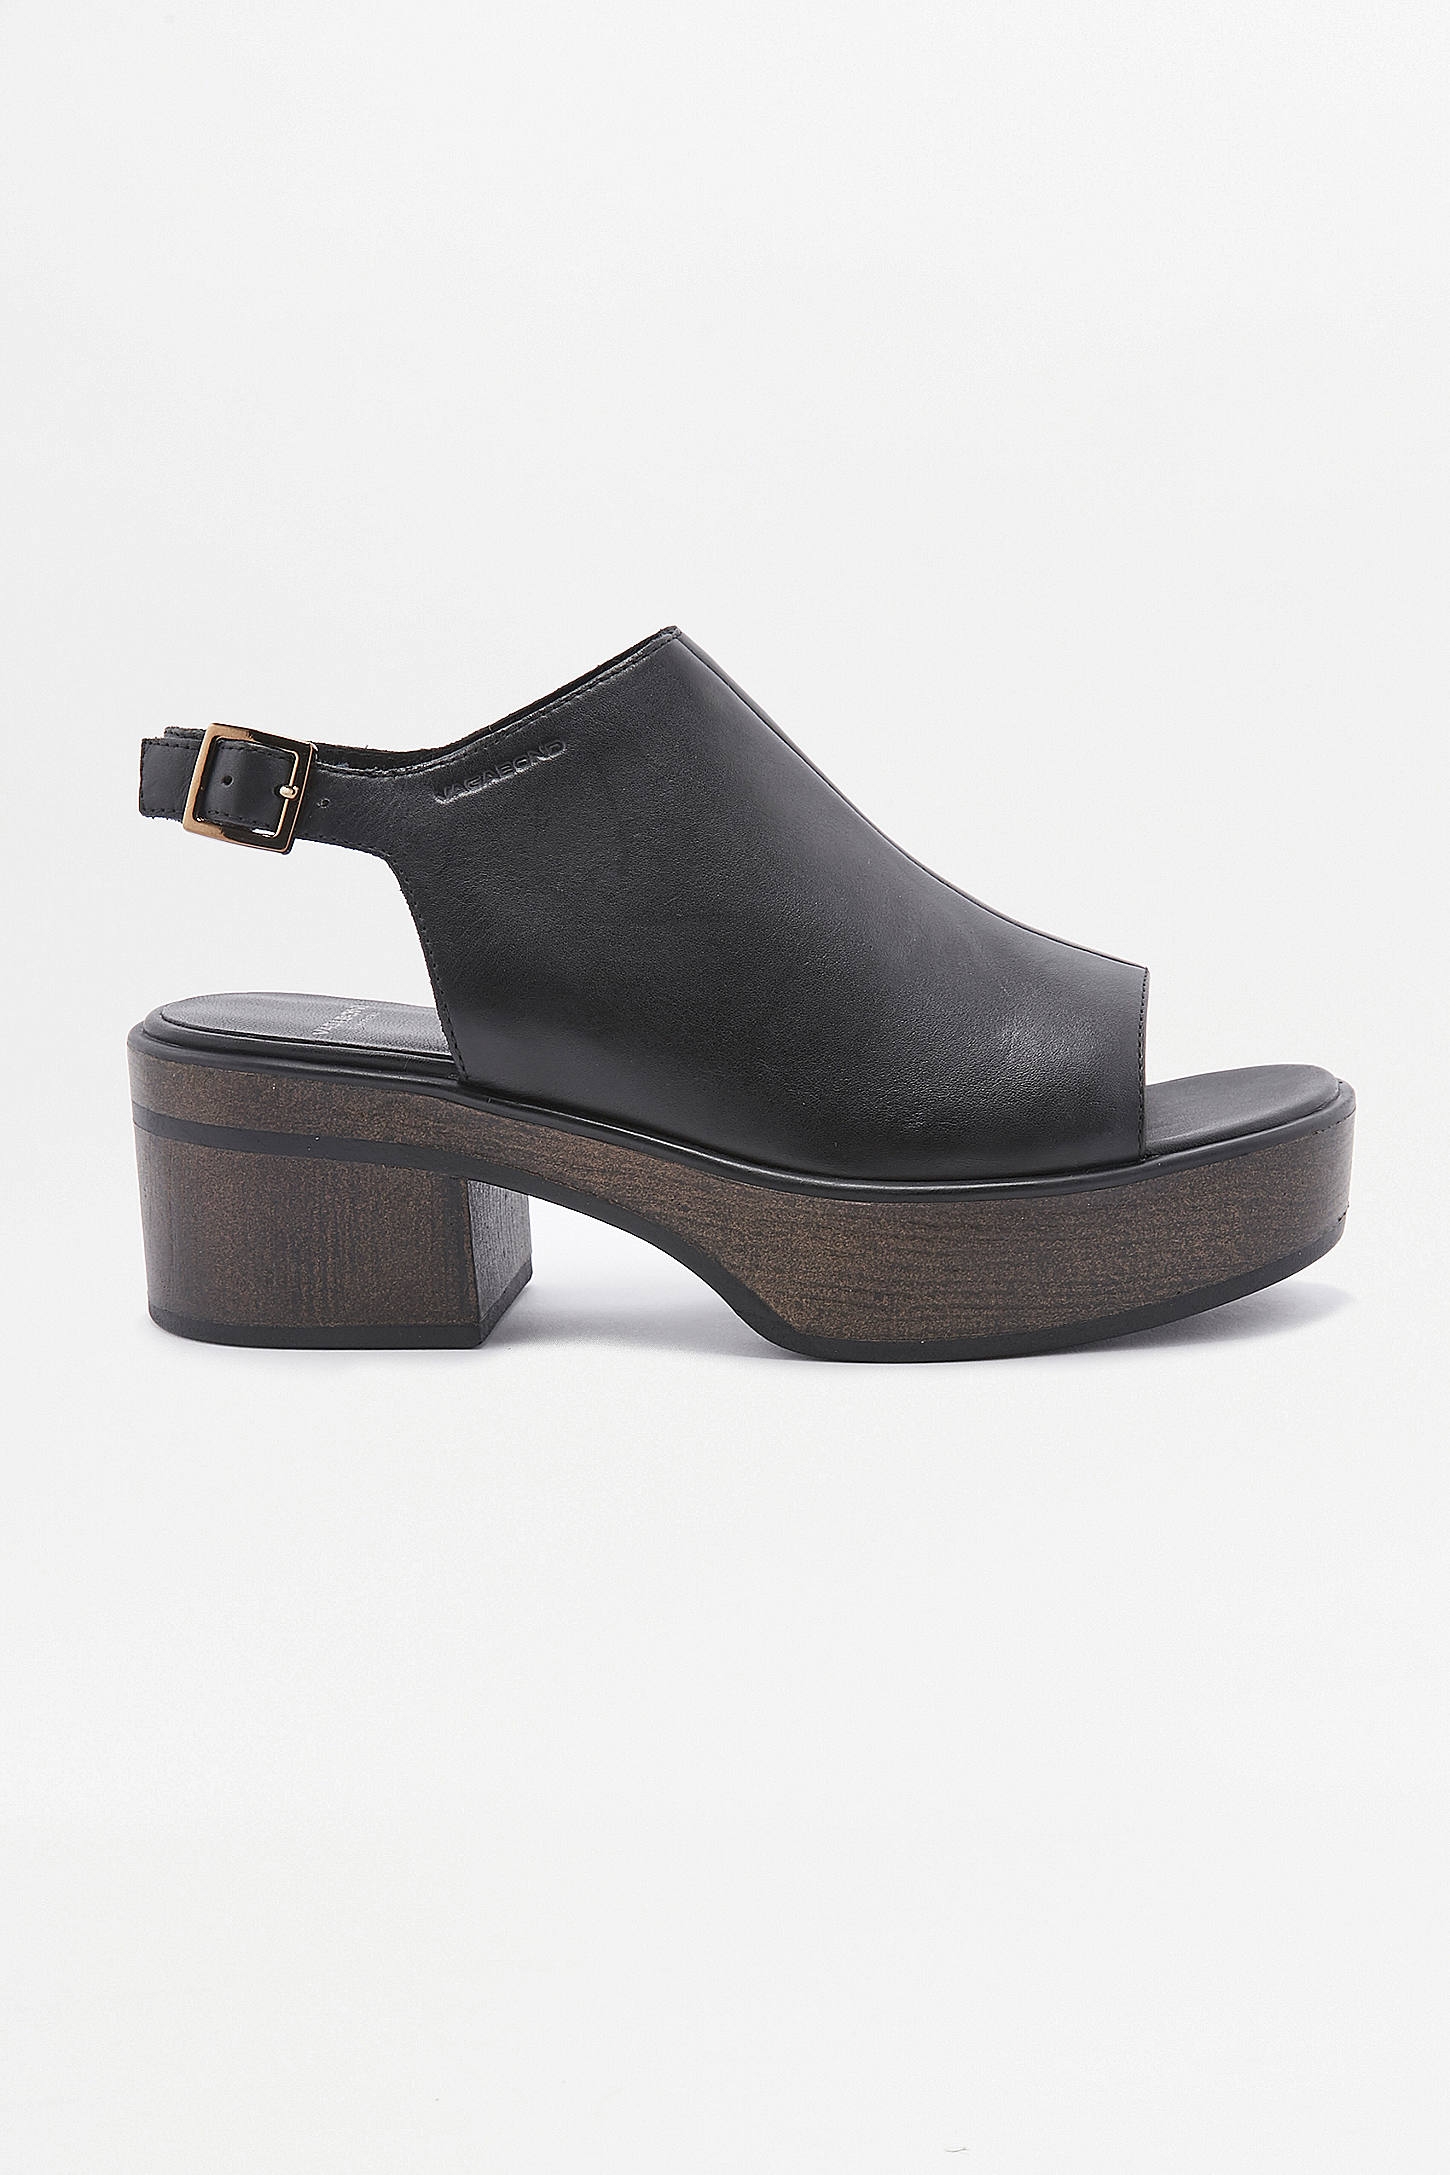 Black vagabond sandals - Slide View 2 Vagabond Noor Black Leather Platform Sandals